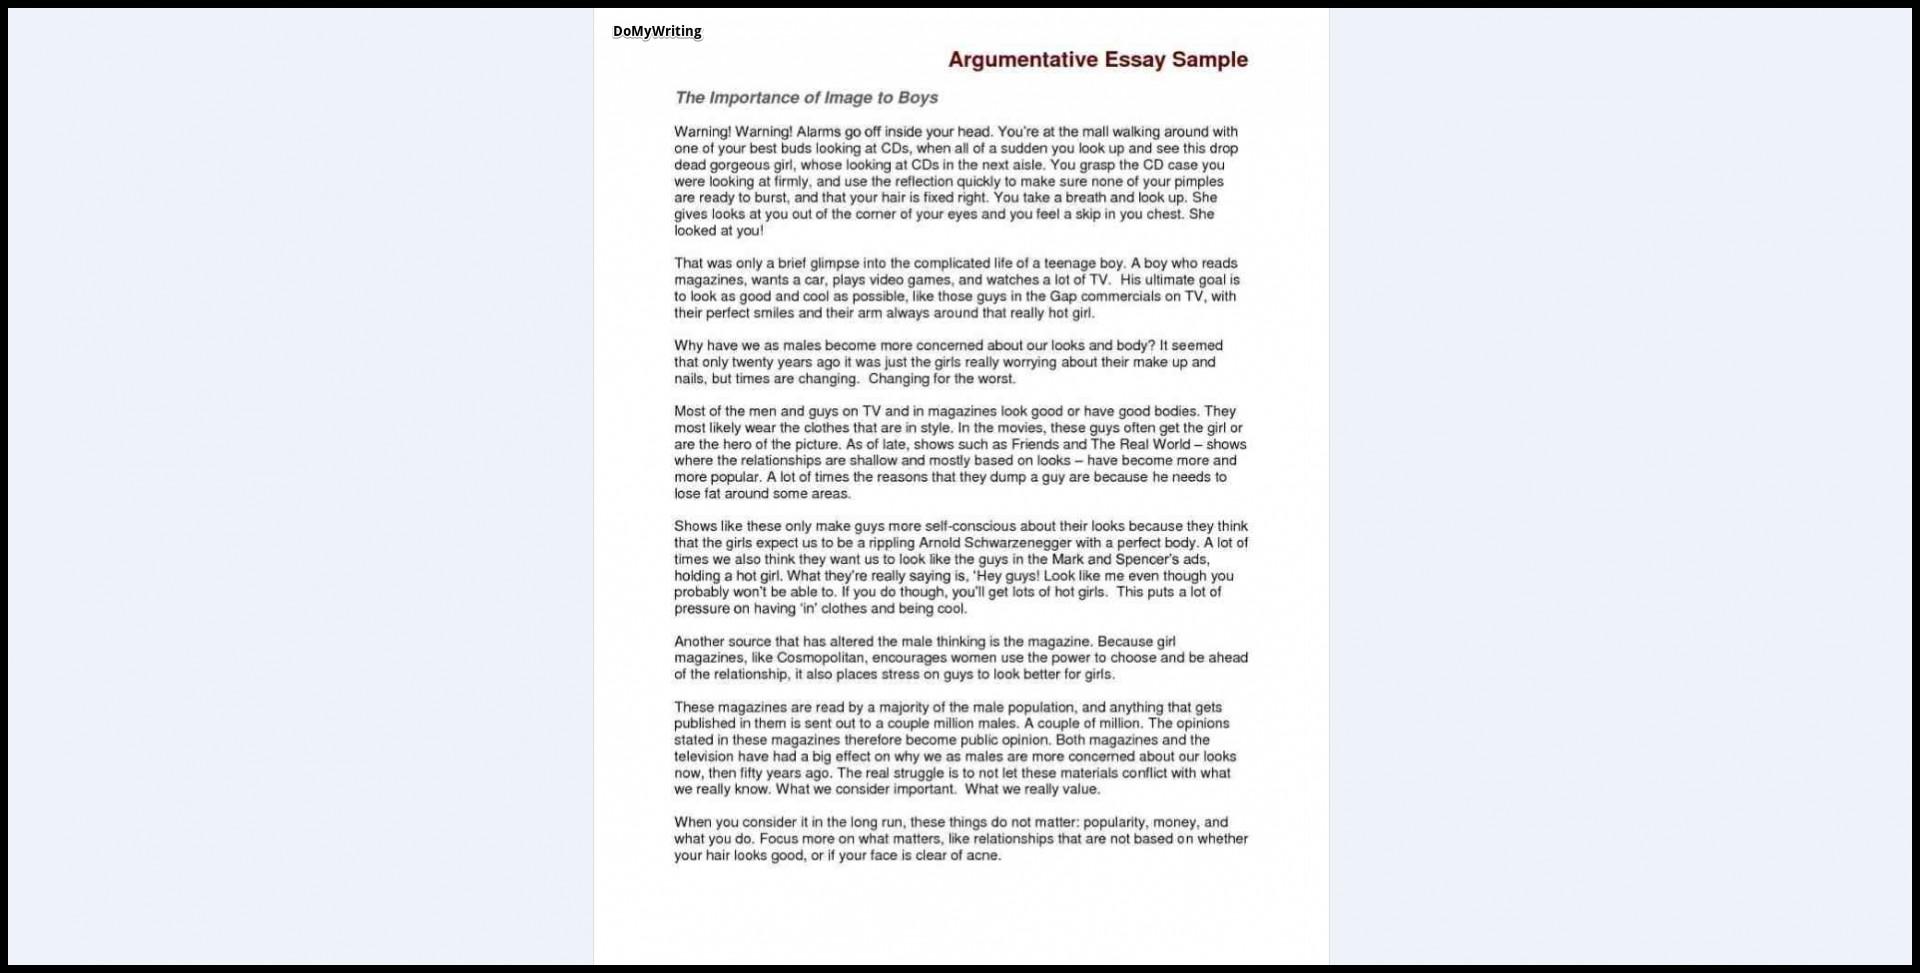 005 Argumentative Essay Sample Good Topics For Discursive Wonderful A Interesting Higher Persuasive 1920